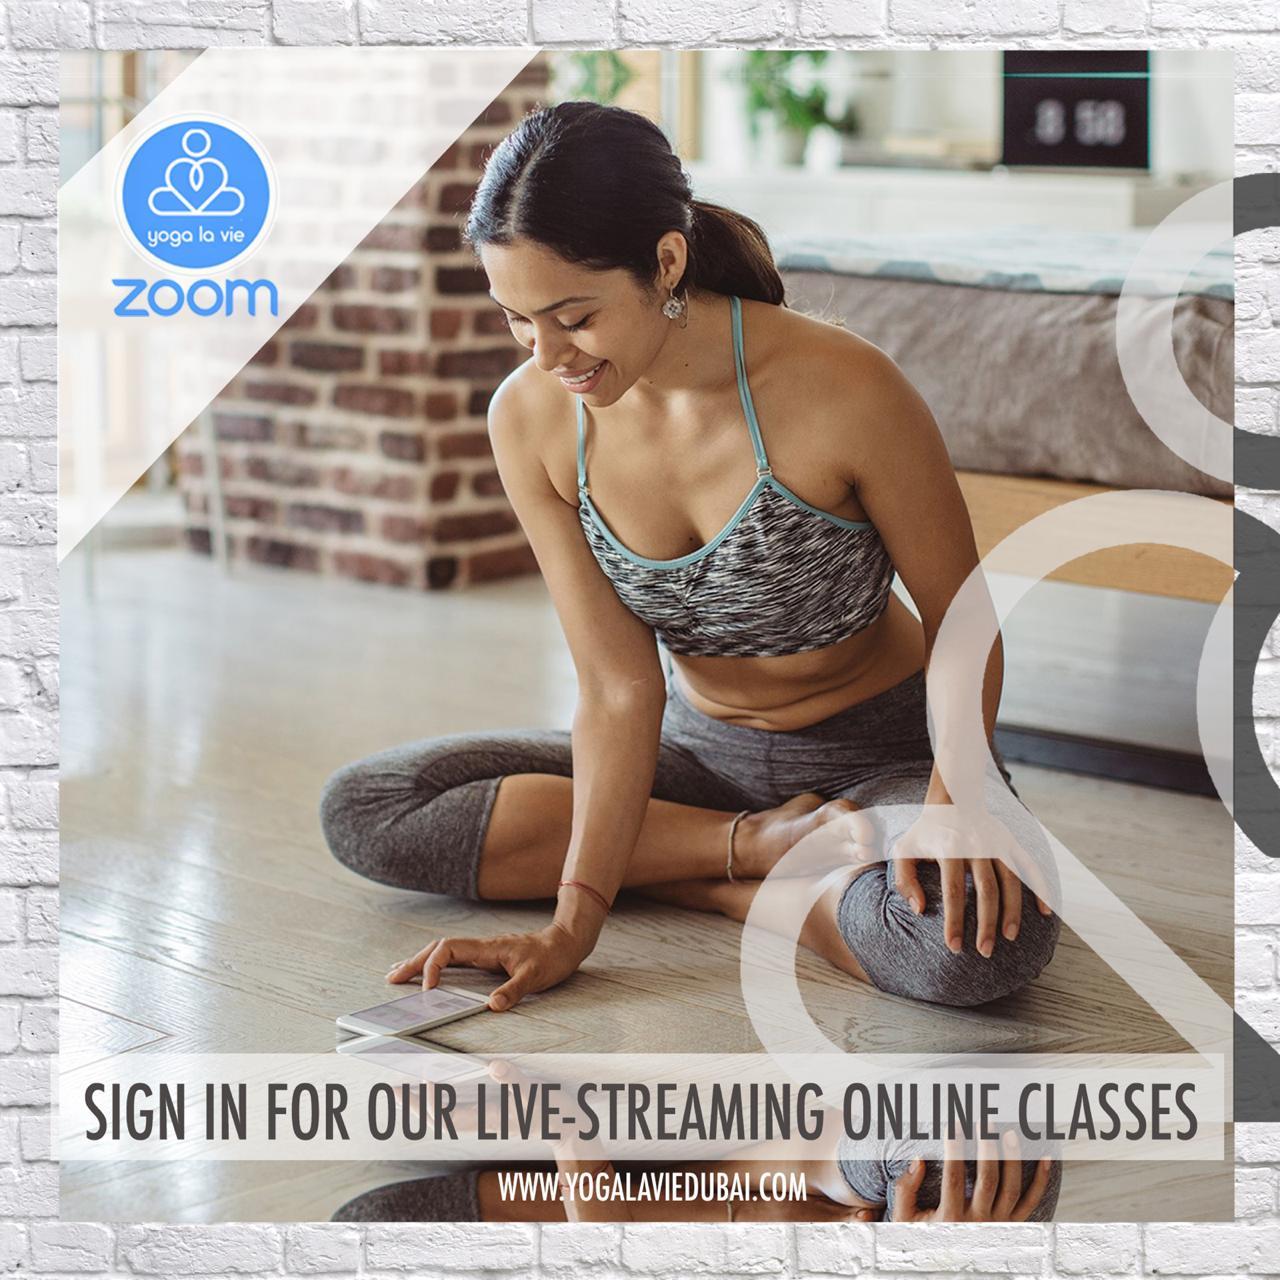 yogalaviedubai - single online class